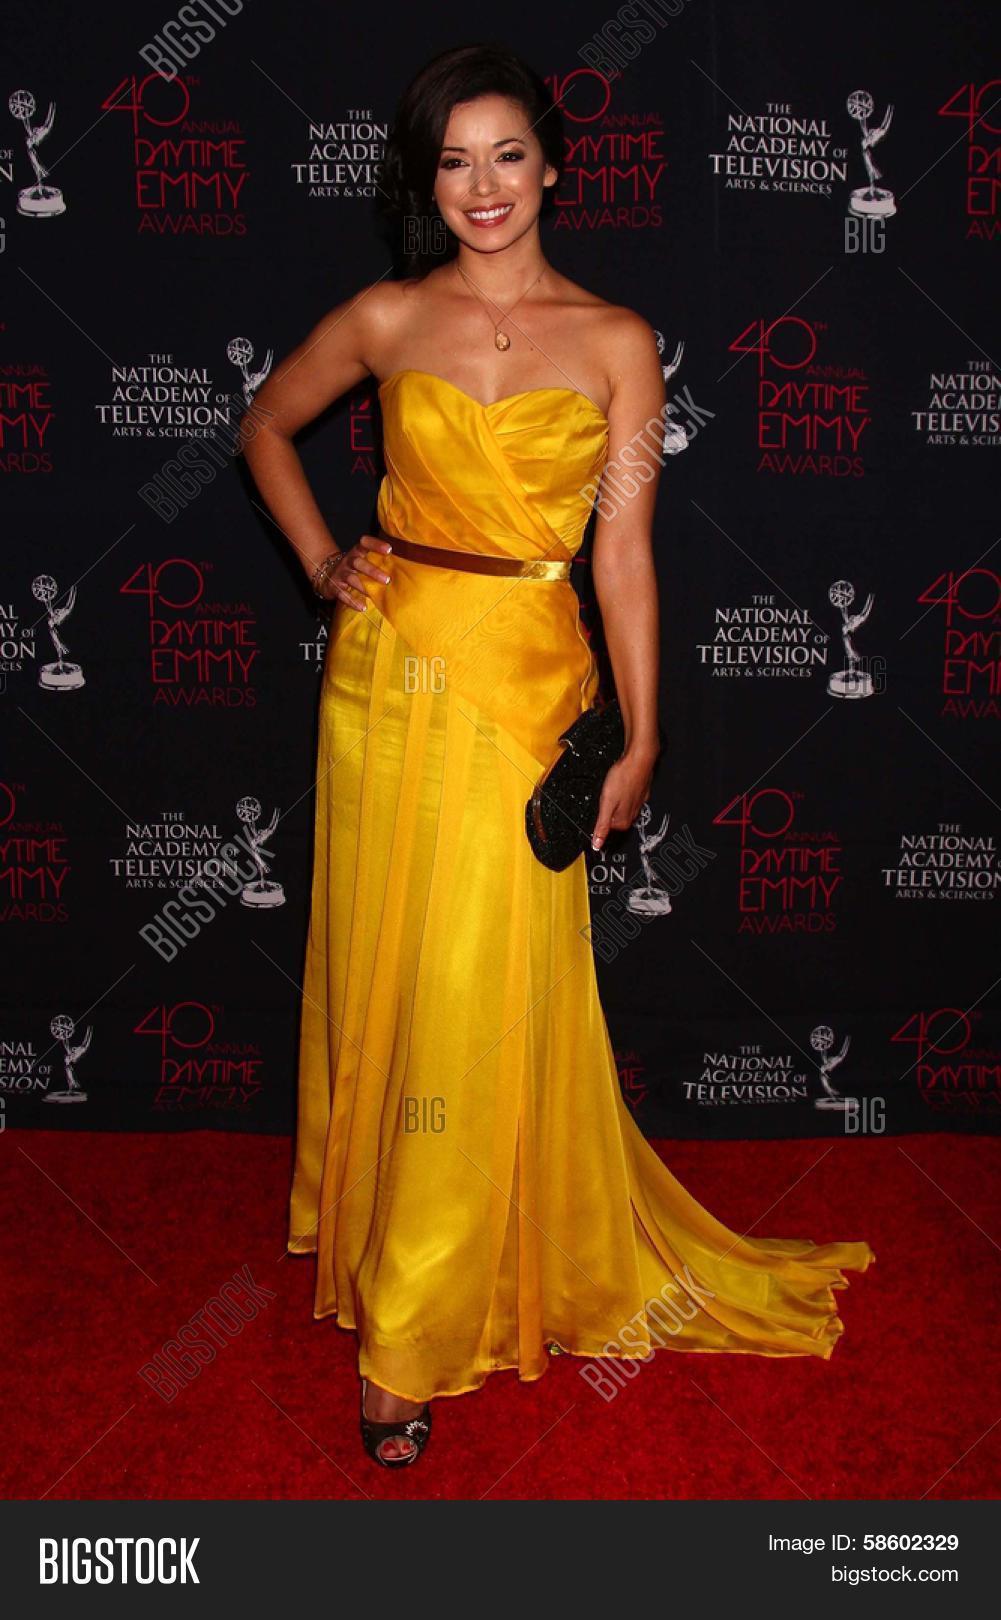 Kara Tointon (born 1983),Catherine Zeta-Jones (born 1969) Sex movies Lisa Gastoni,Sharon Angela